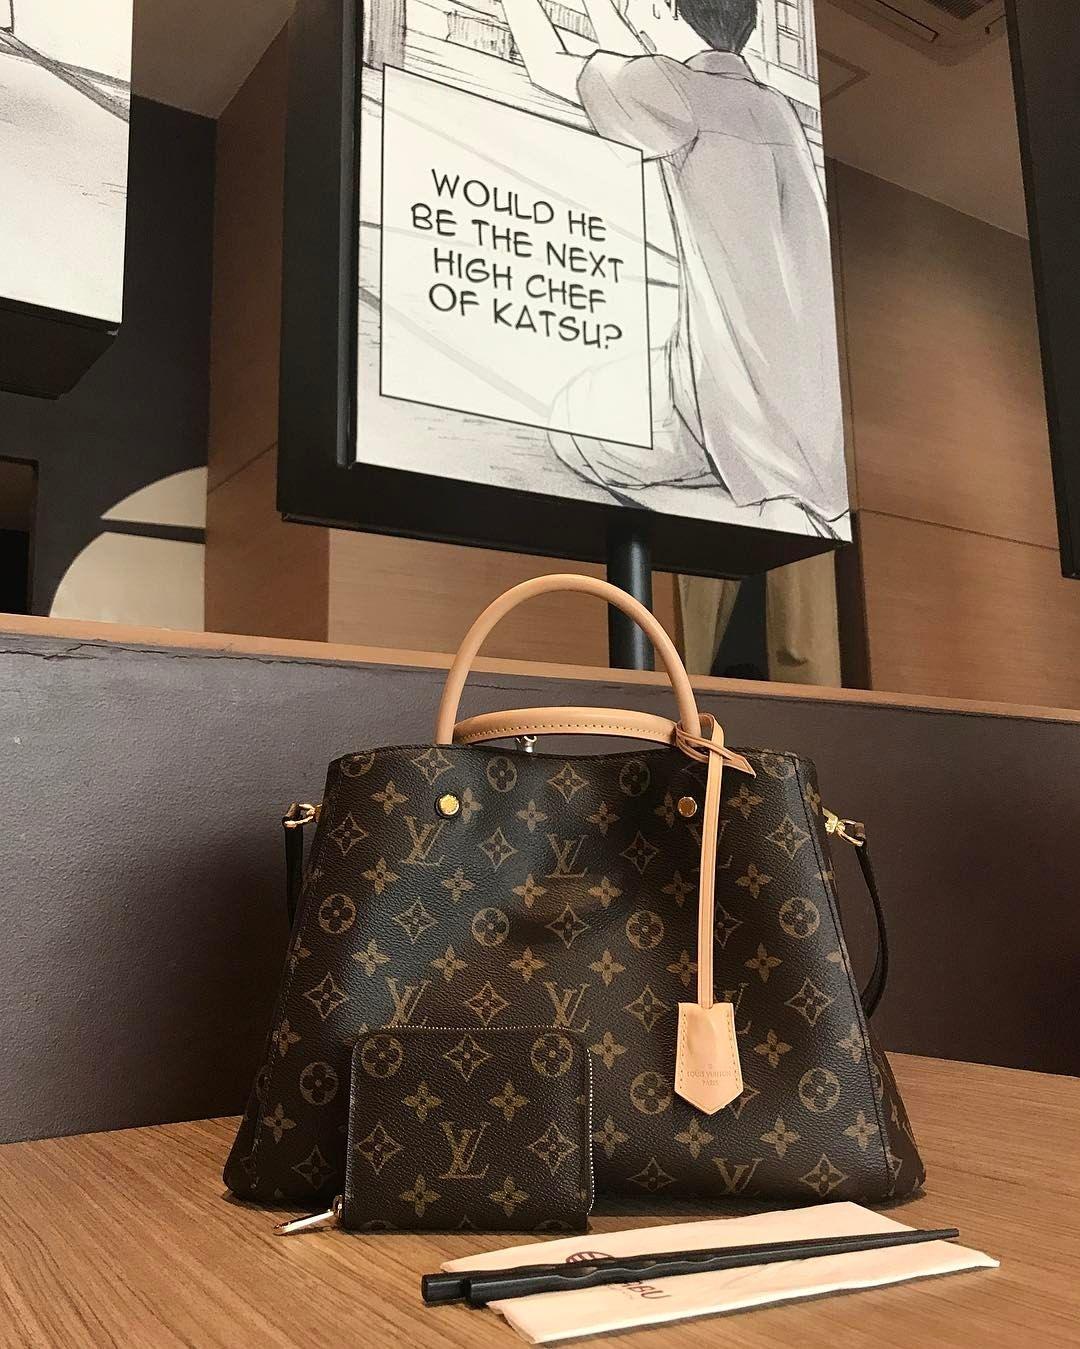 Louis Vuitton Montaigne Beautiful Dream Crossbody Handbags For Girls Louis Vuitton Bag Neverfull Louis Vuitton Louis Vuitton Bag